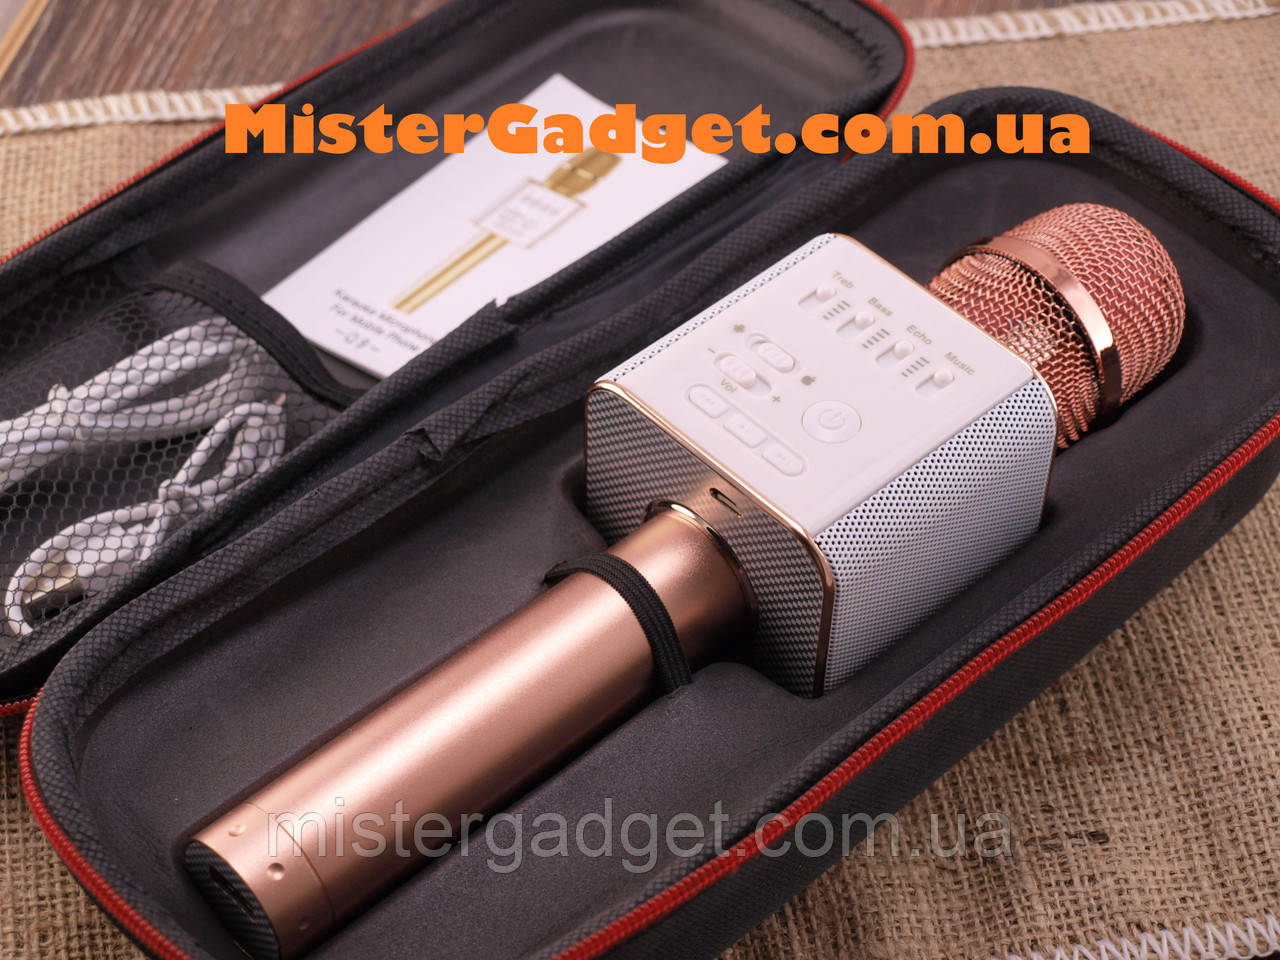 Микрофон для караоке Q9 Колонка блютуз